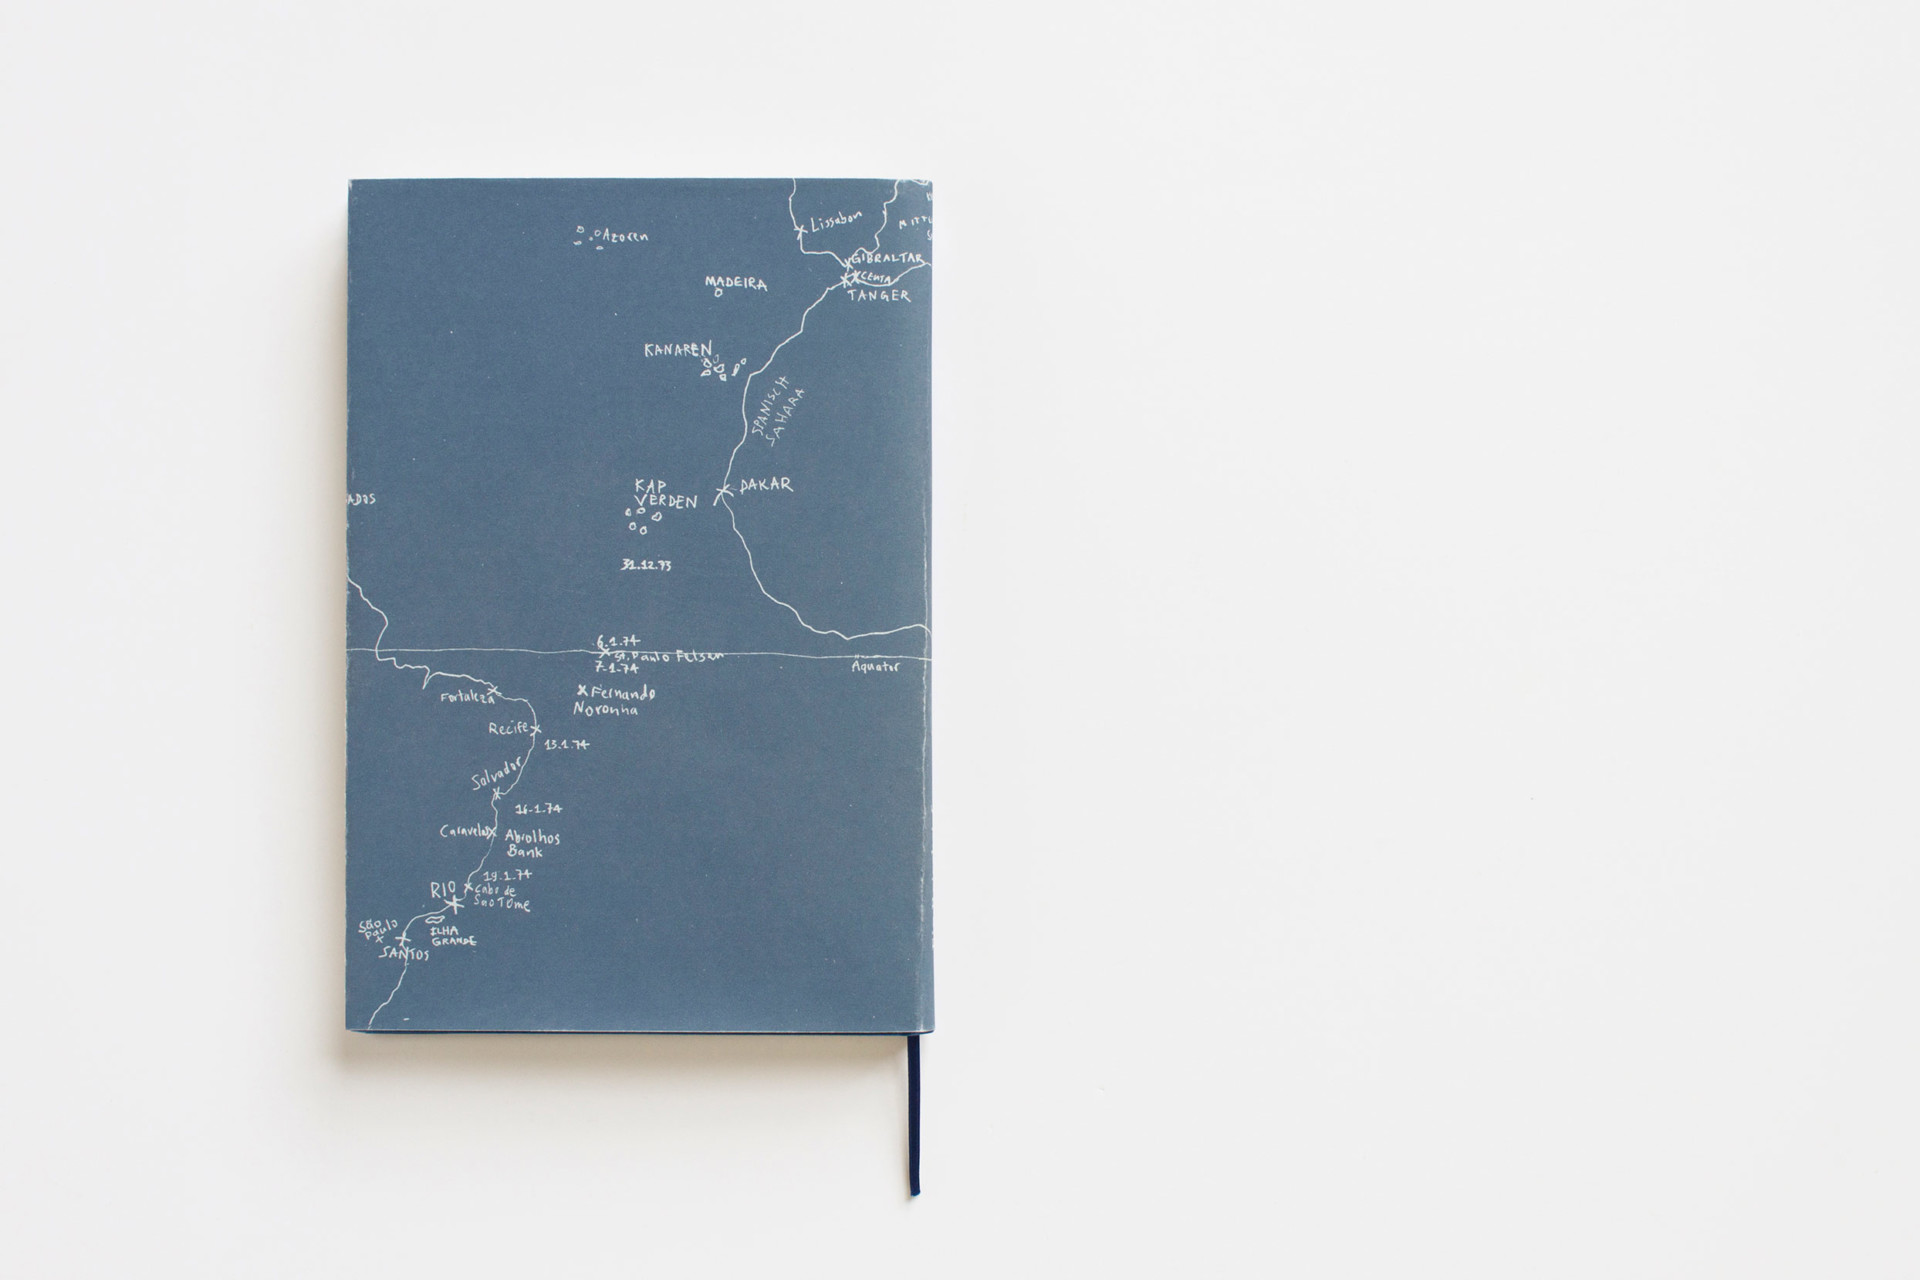 Merle Michaelis / Lettering & Typografie Ein Reisebrief